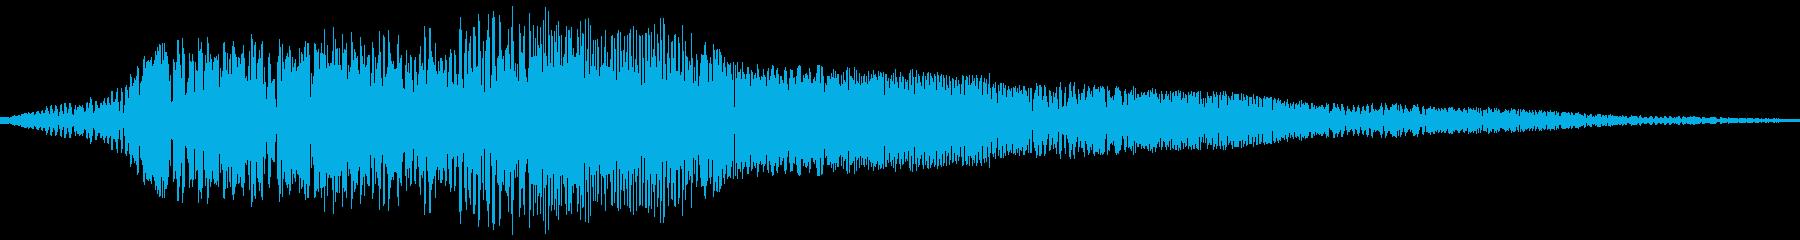 AMGアナログFX 8の再生済みの波形